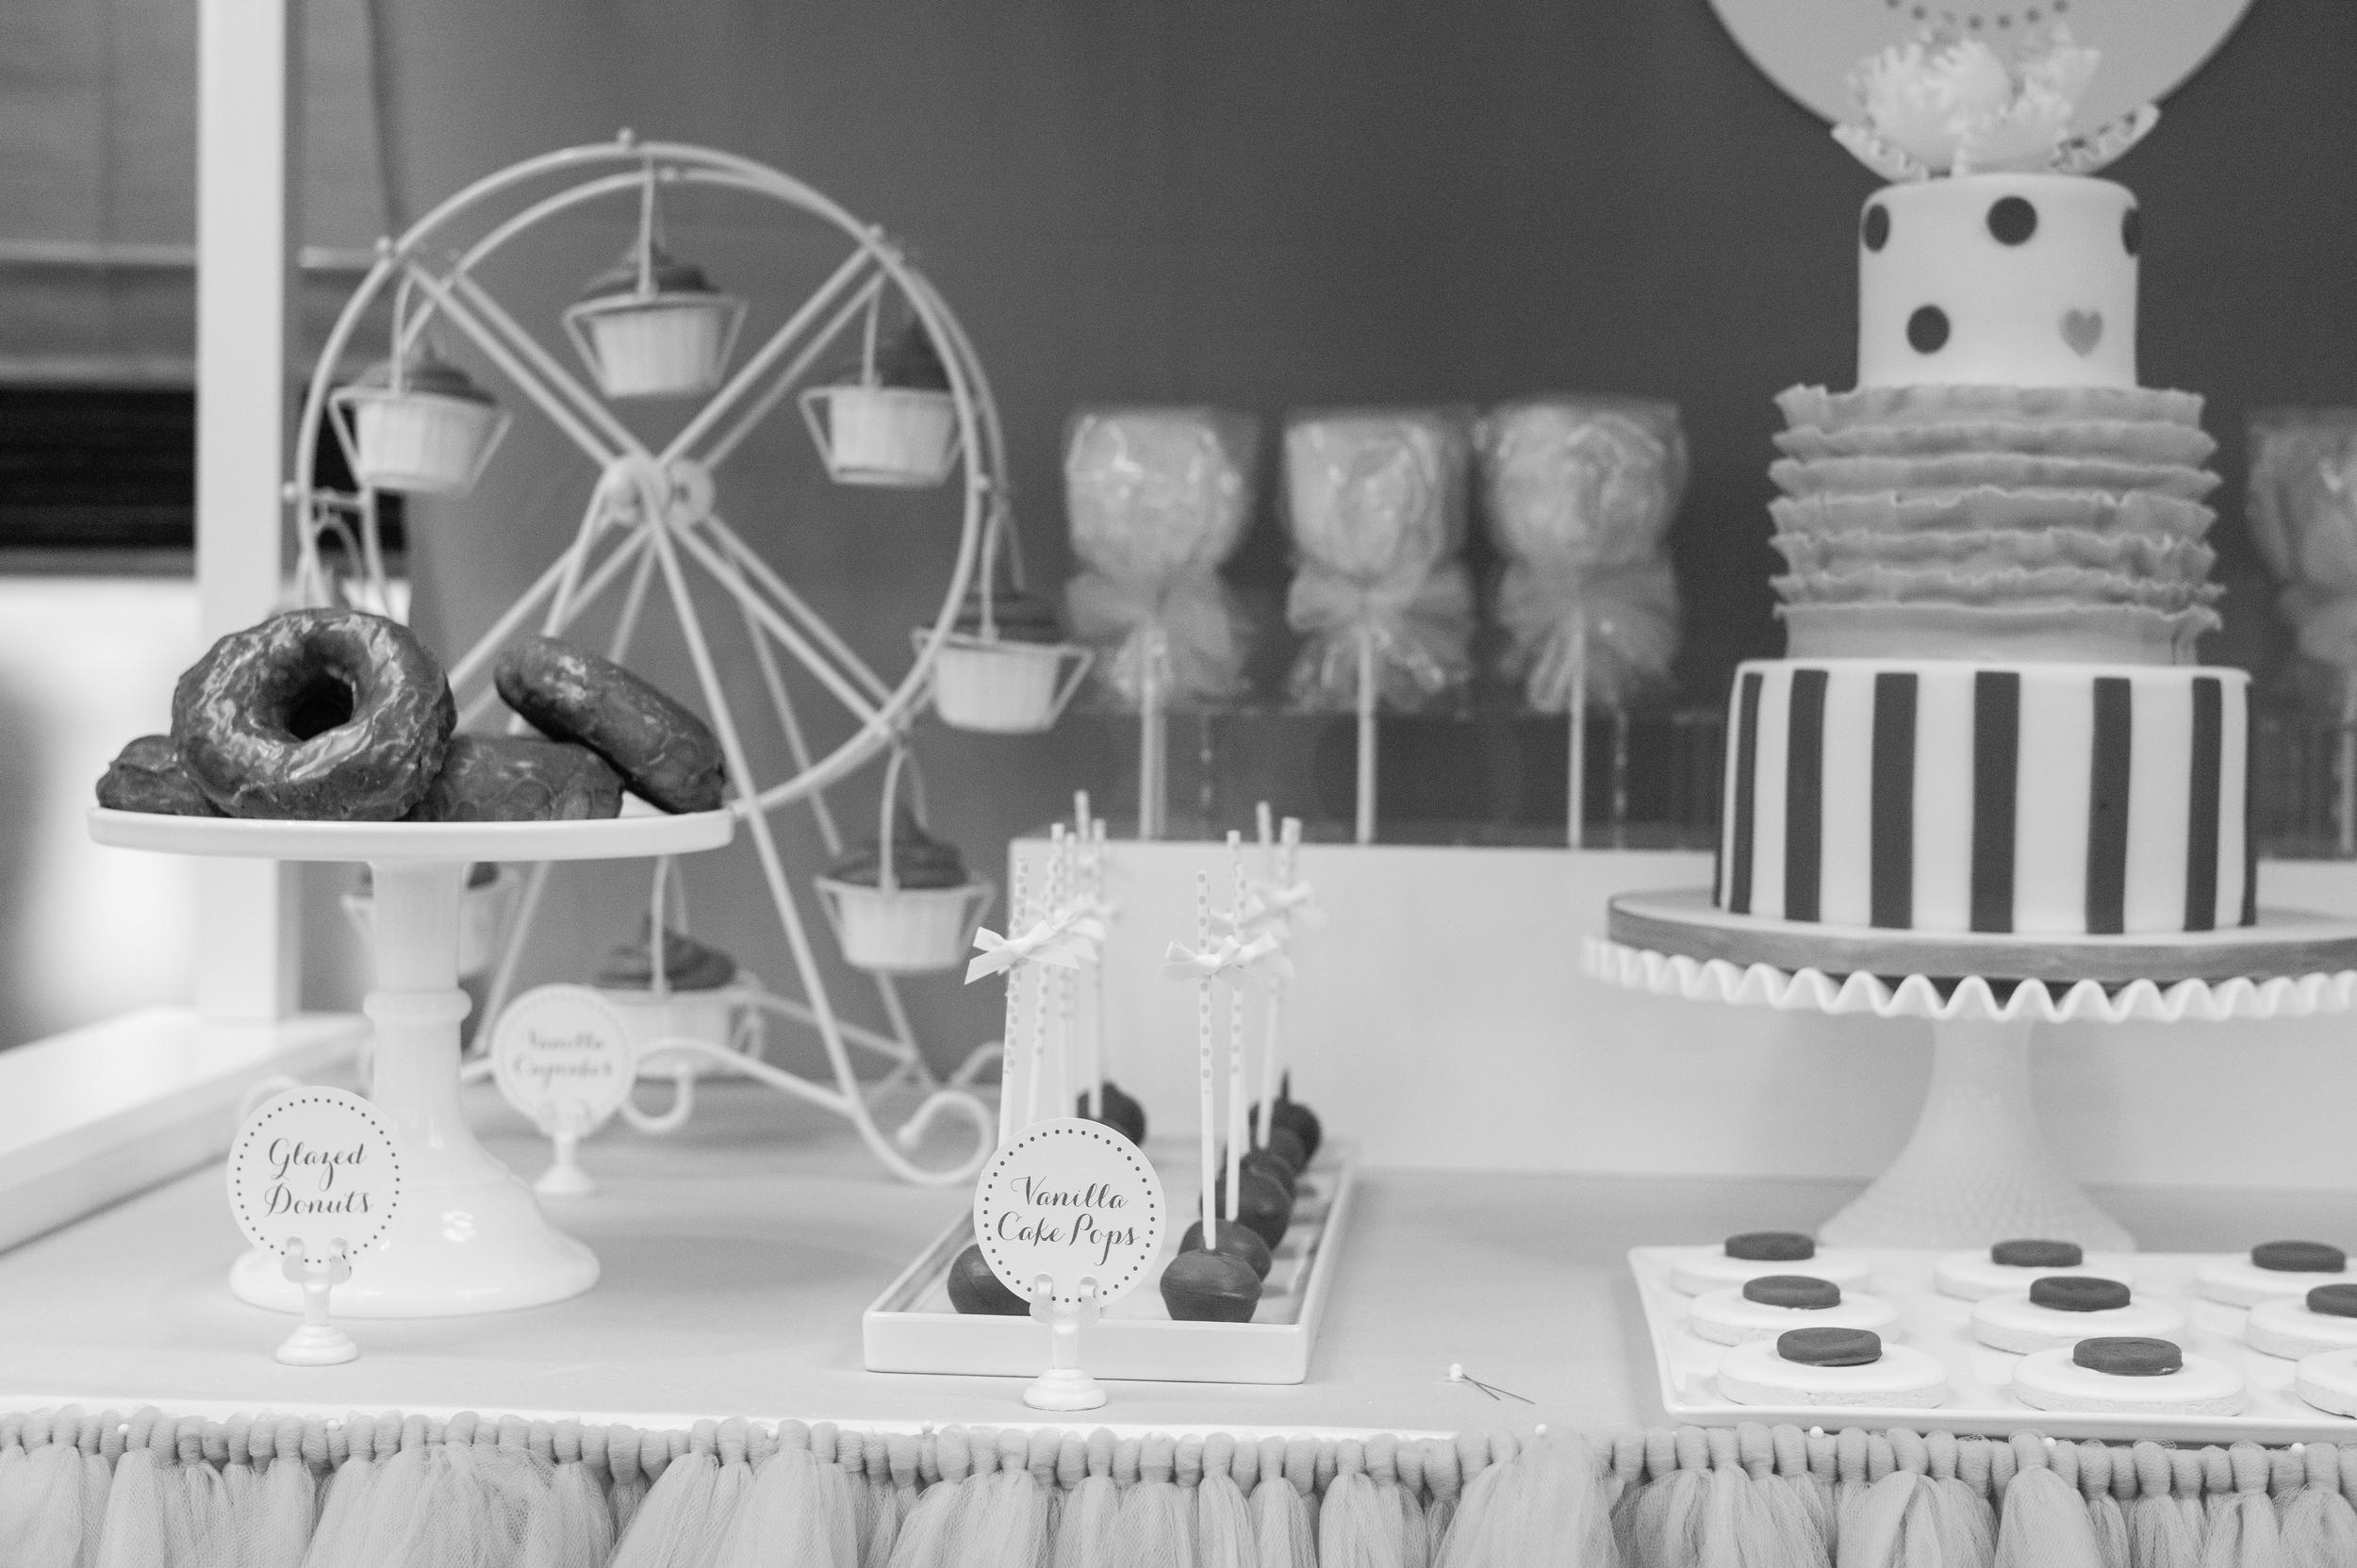 desserts-1001114.jpg